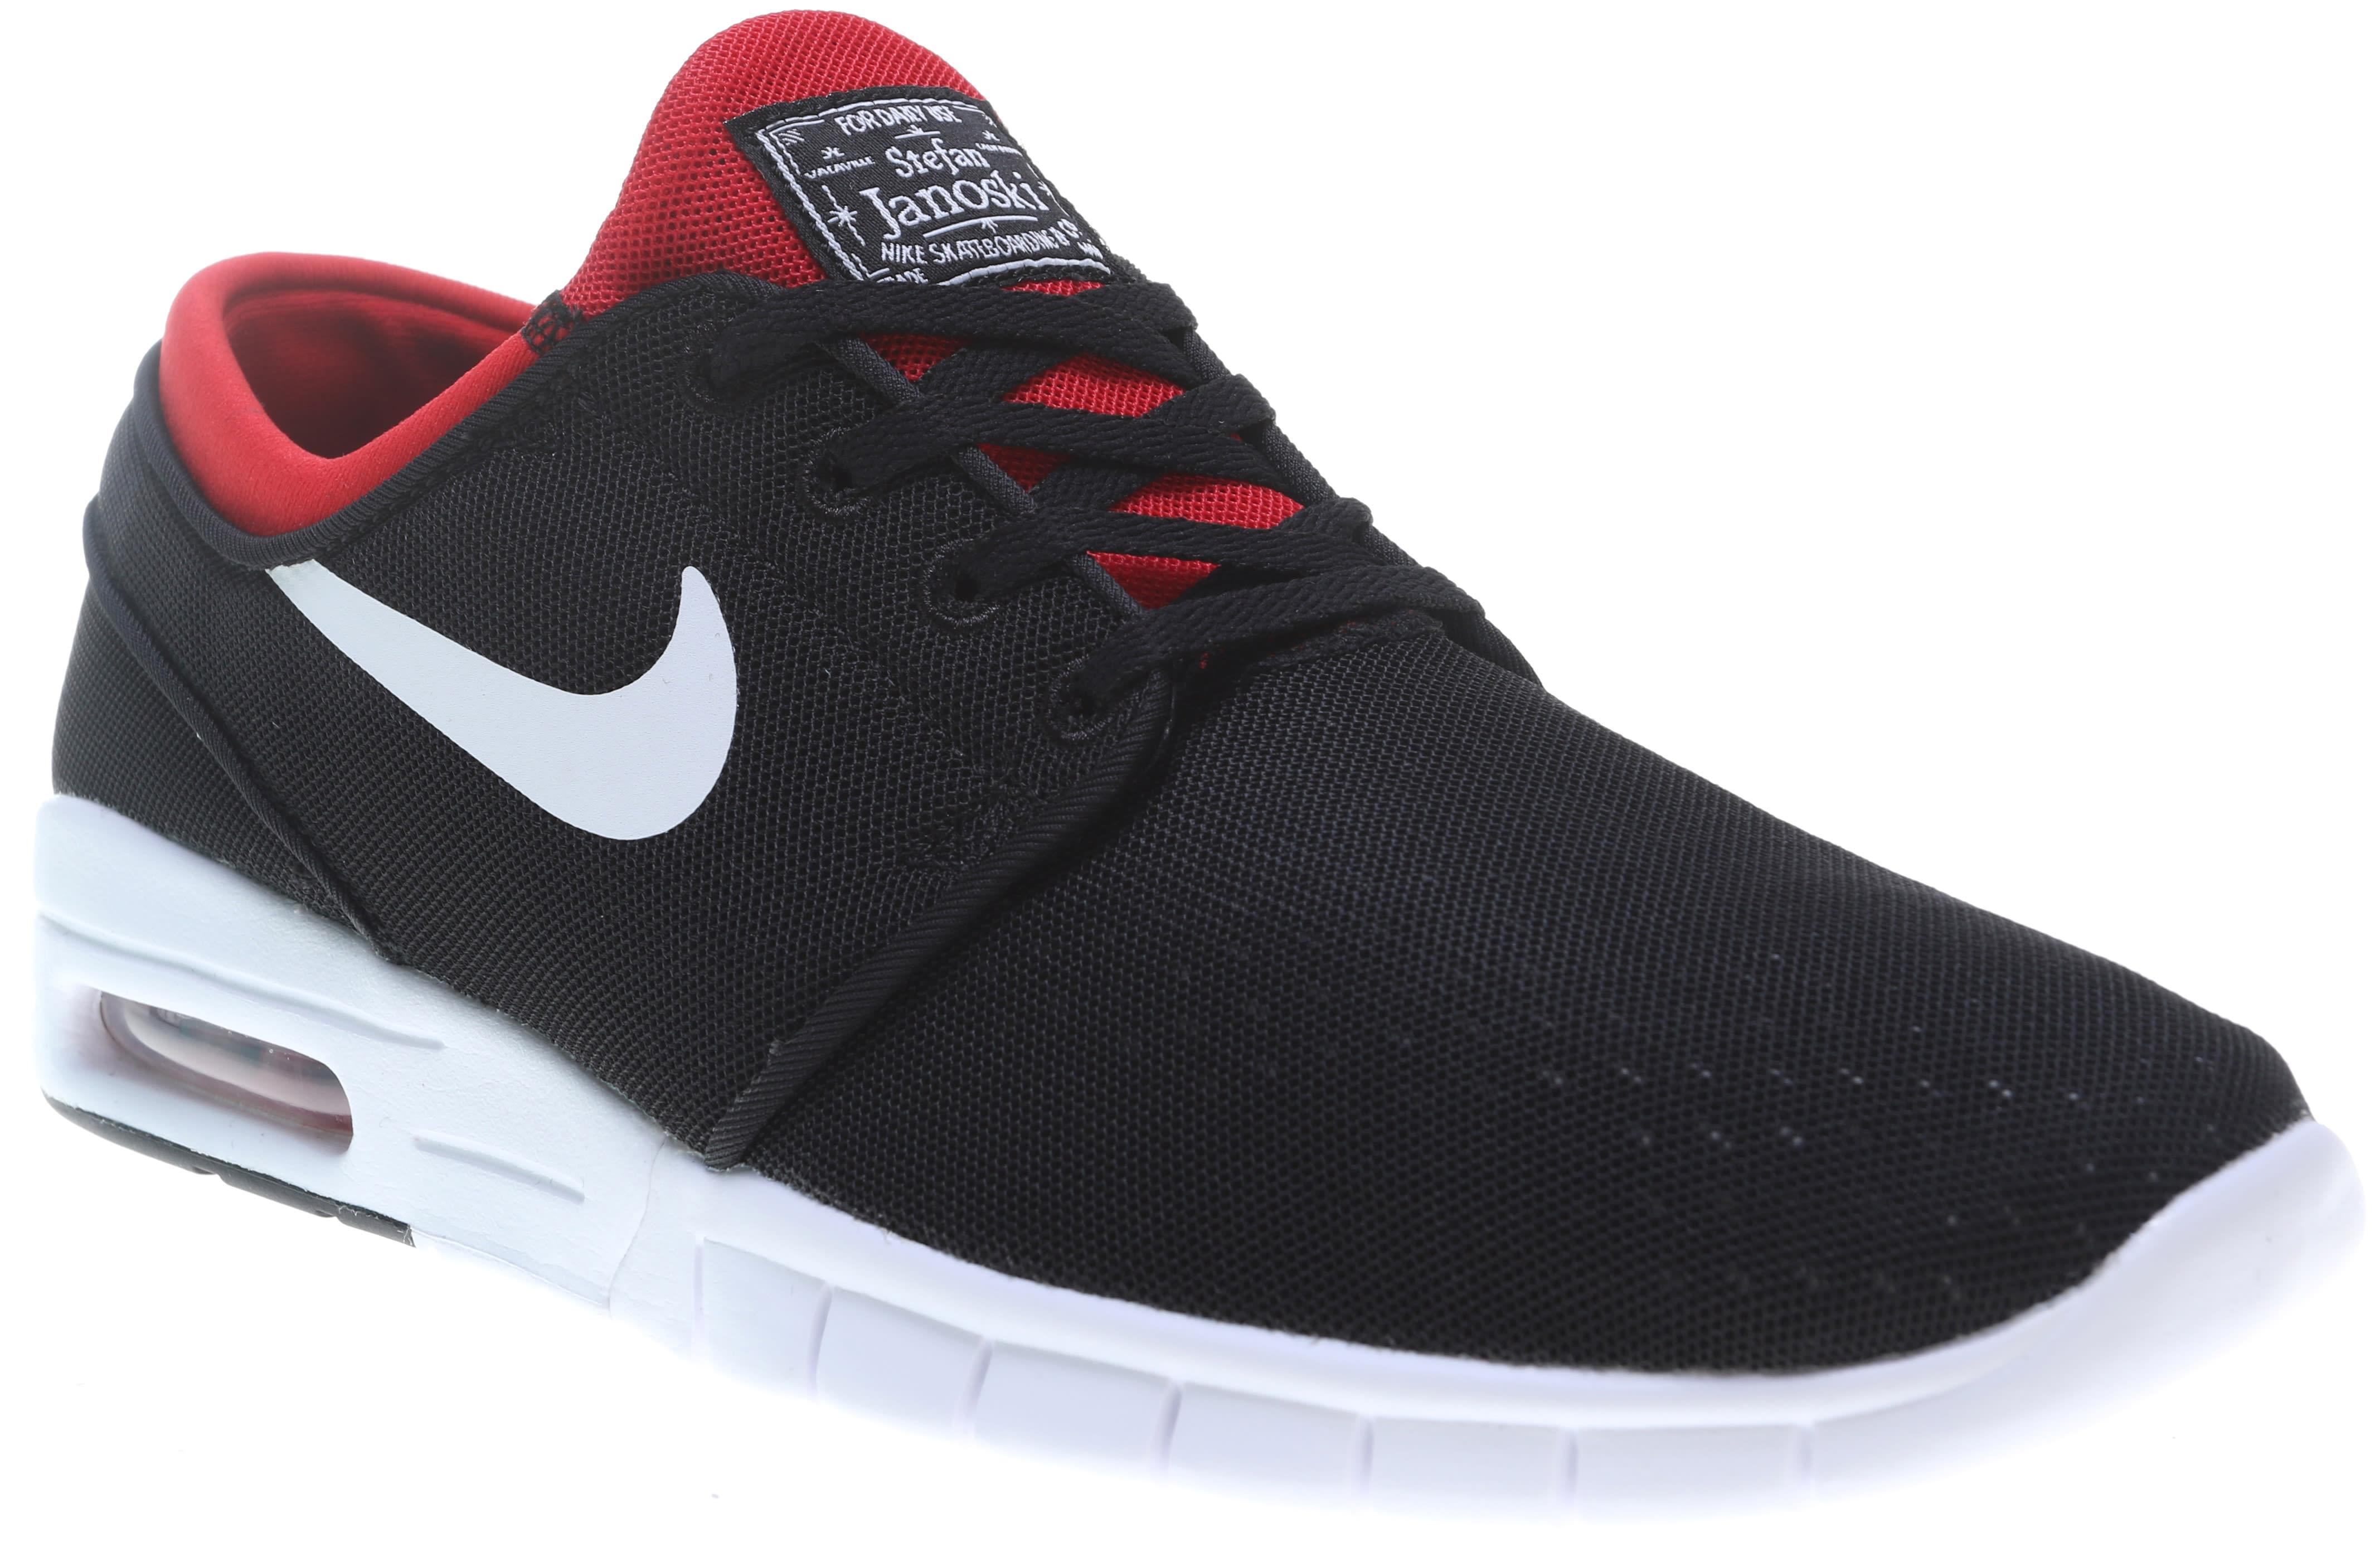 reputable site 39bca 4e2b5 Nike Stefan Janoski Max Skate Shoes - thumbnail 2